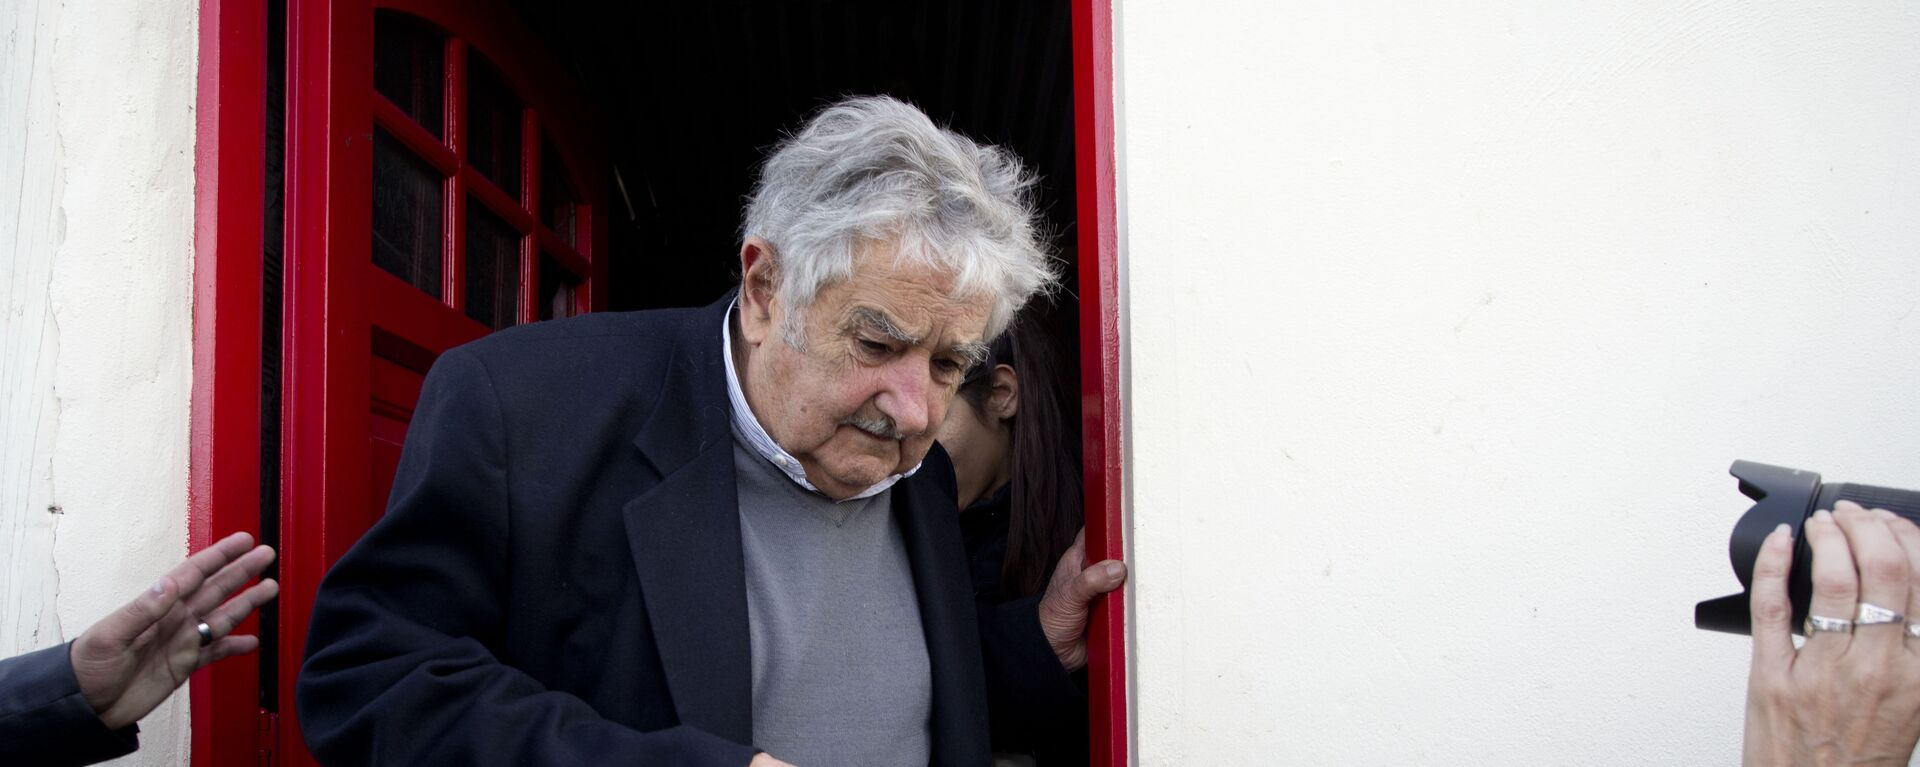 Uruguay's former President Jose Mujica - Sputnik Mundo, 1920, 27.04.2021